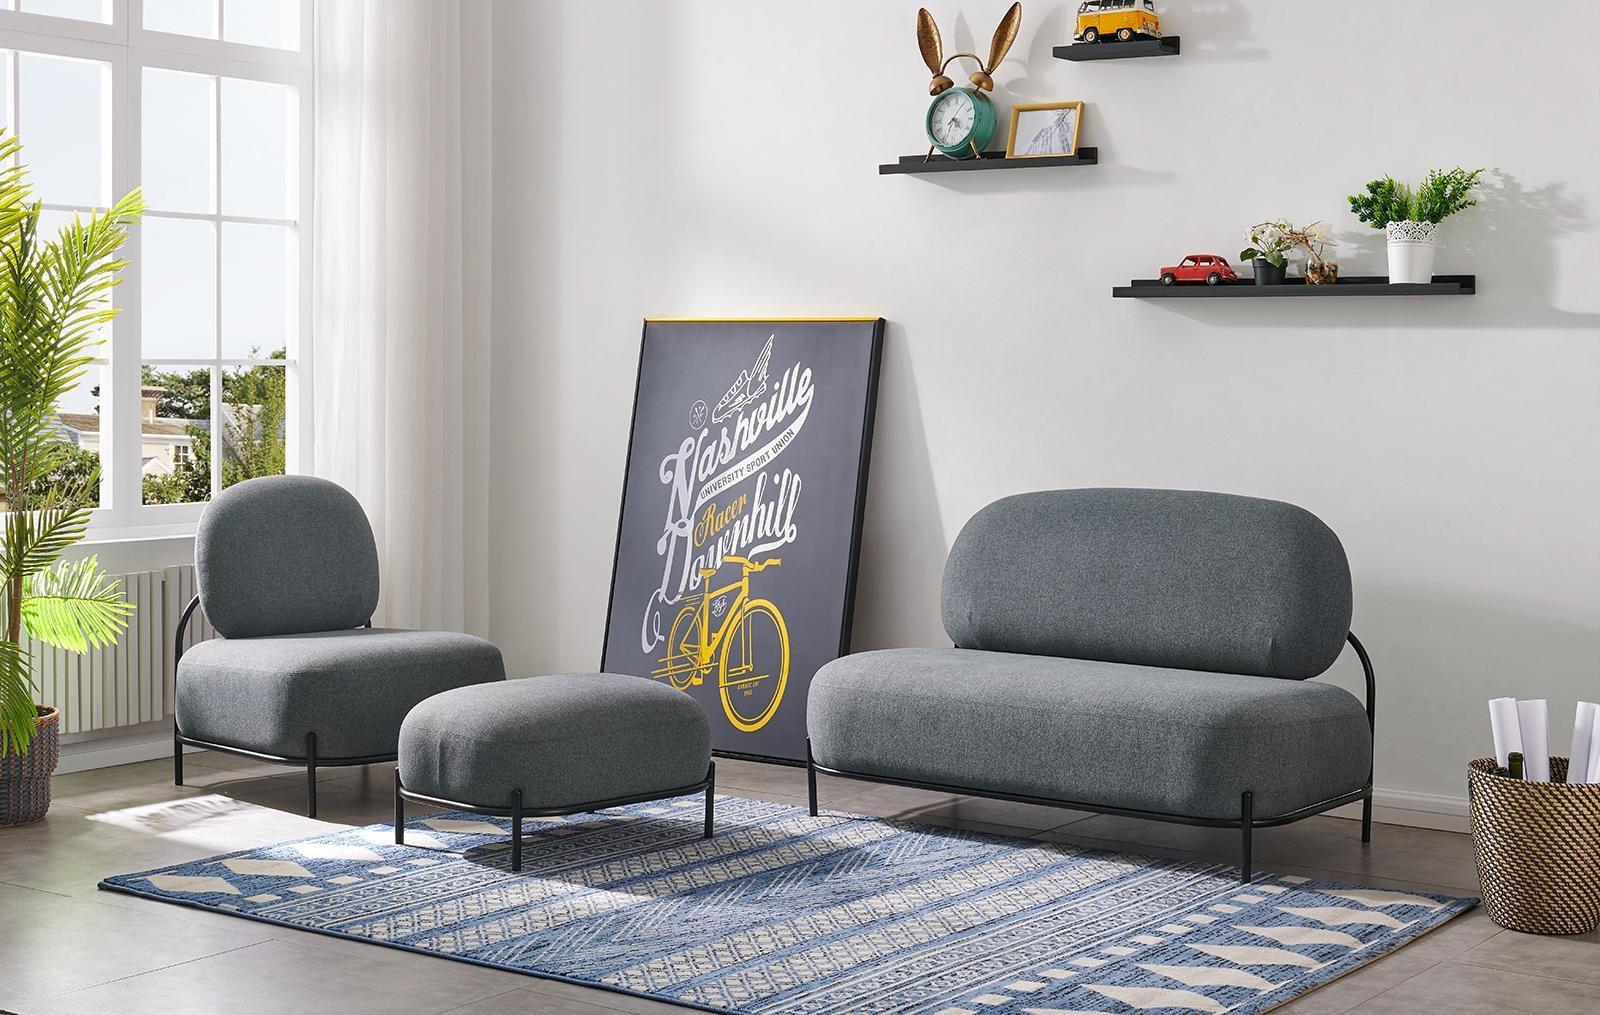 Пуф SOFA-06-0T серый, диван ESF SOFA 06-02 (2-х местный) серый и кресло ESF SOFA 06-01 серый